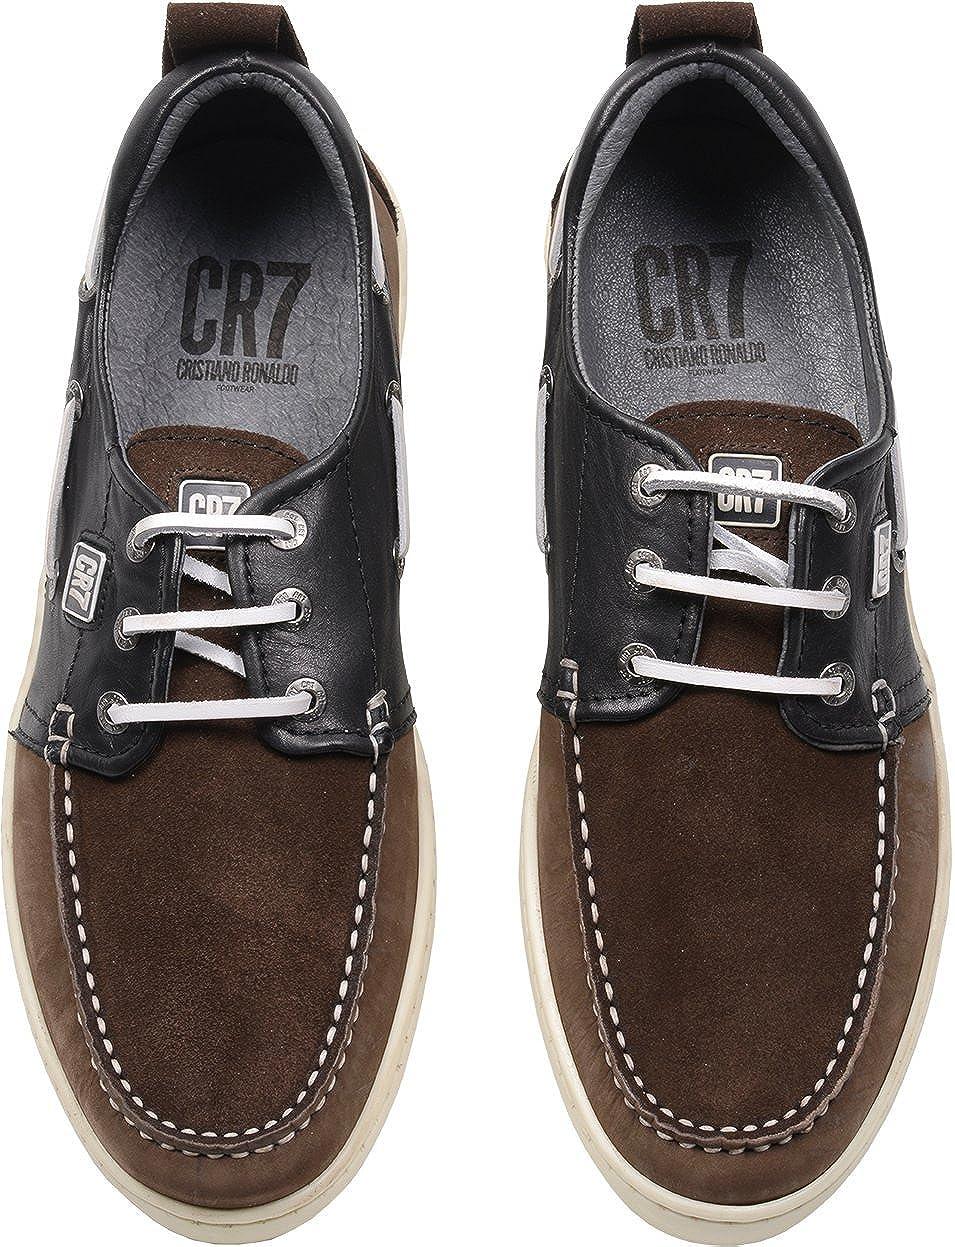 CR7 Cristiano Ronaldo, Modelo Salsa, Náuticos para Hombre: Amazon.es: Zapatos y complementos